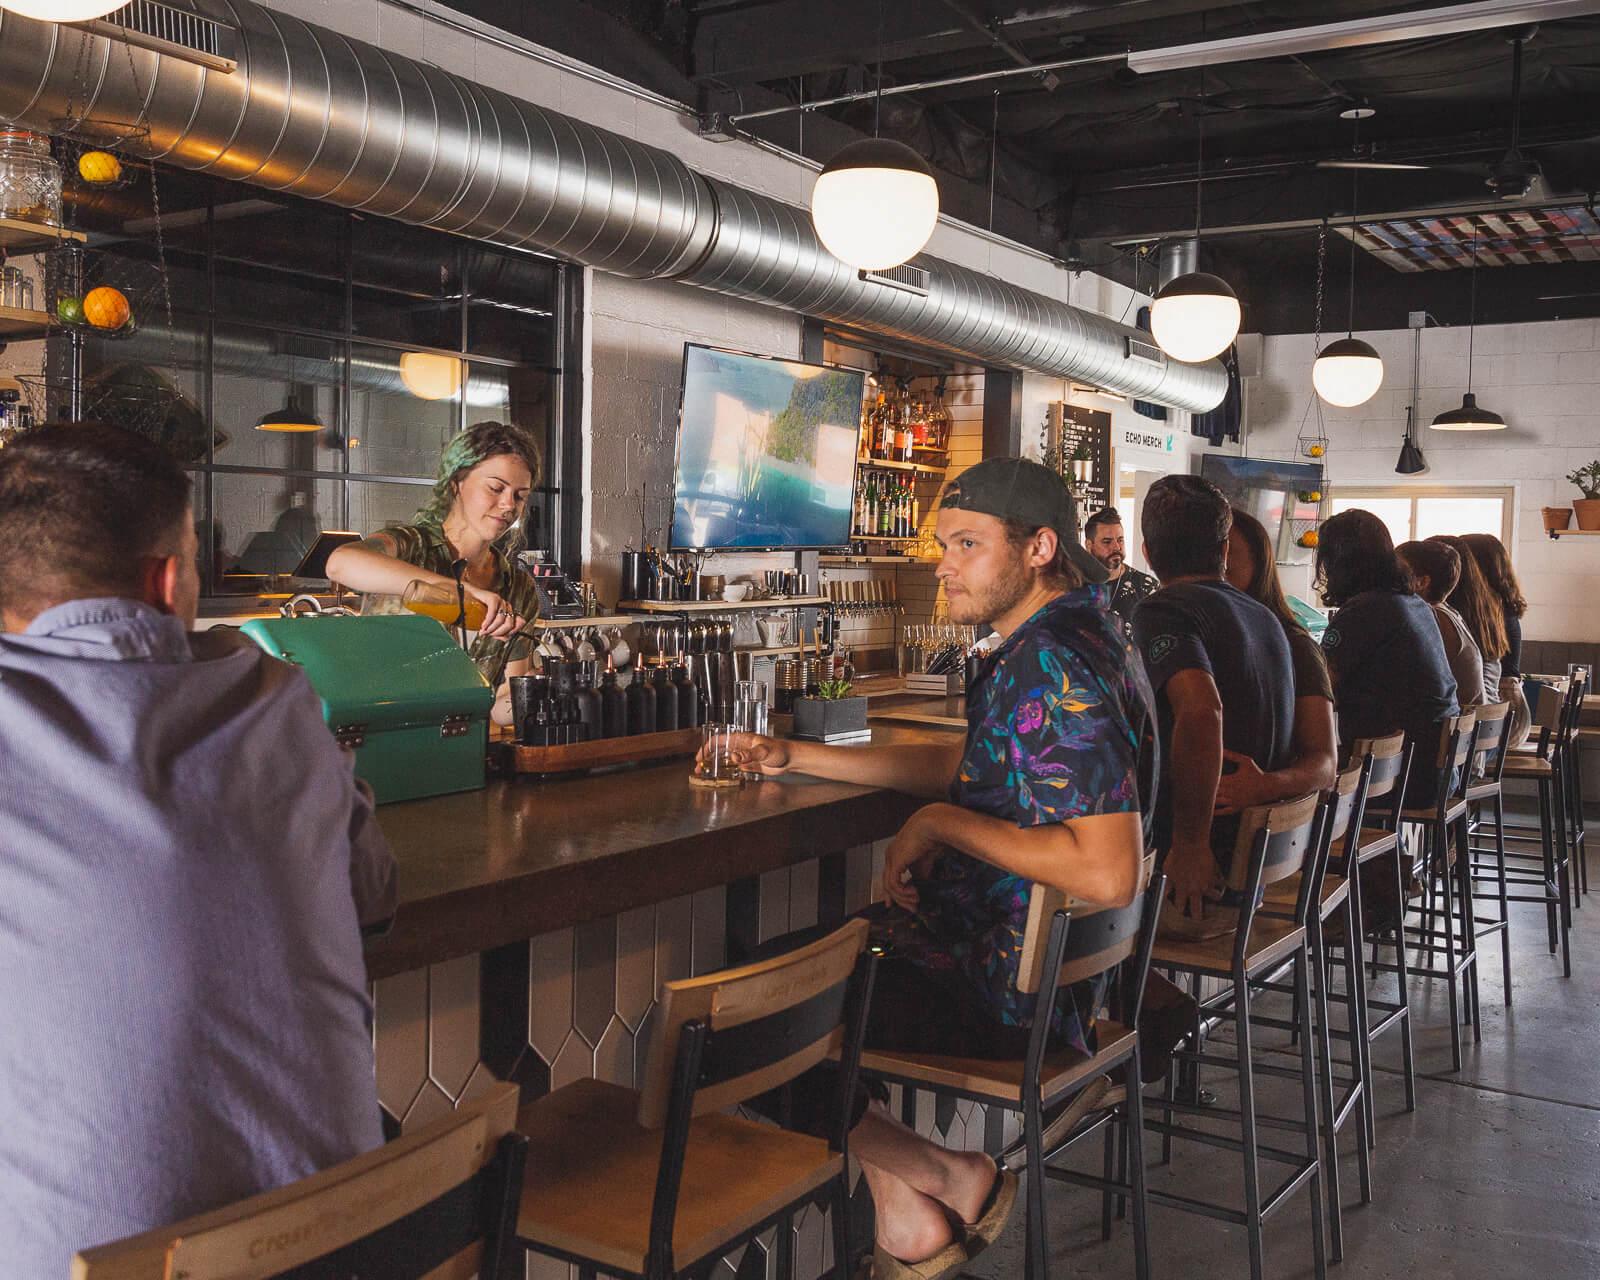 Two guests talking at a full bar